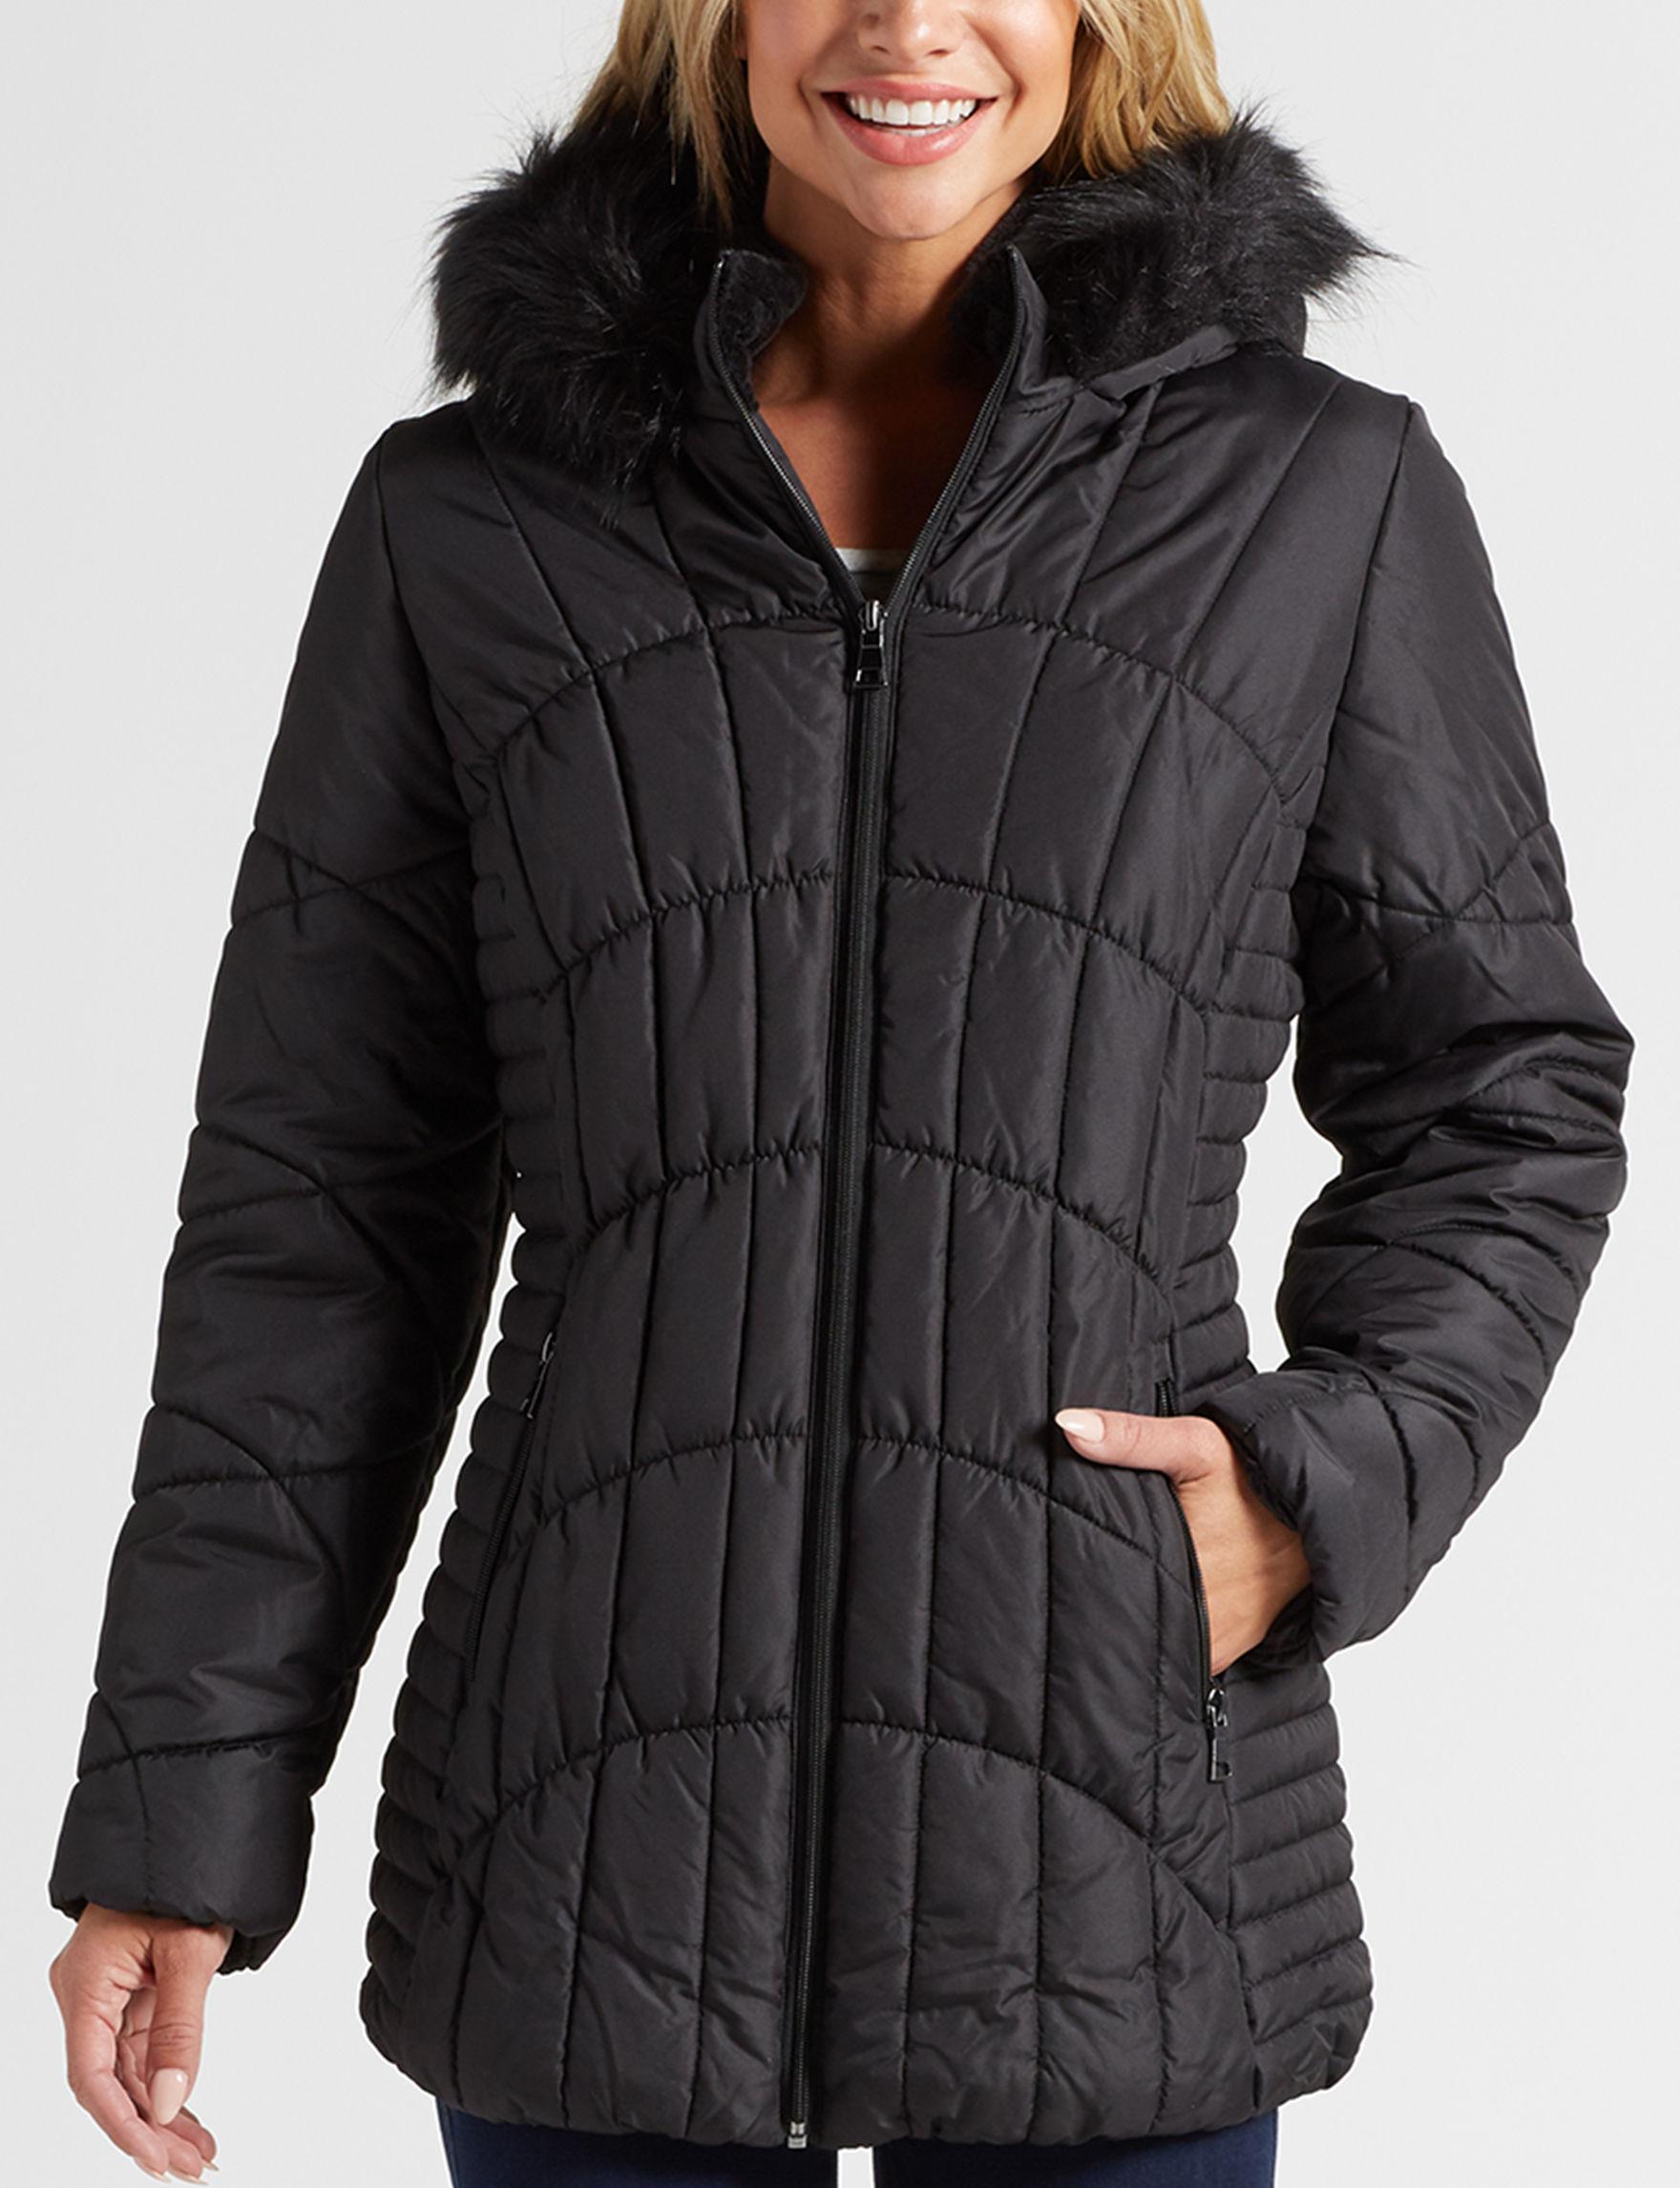 Below Zero Black Puffer & Quilted Jackets